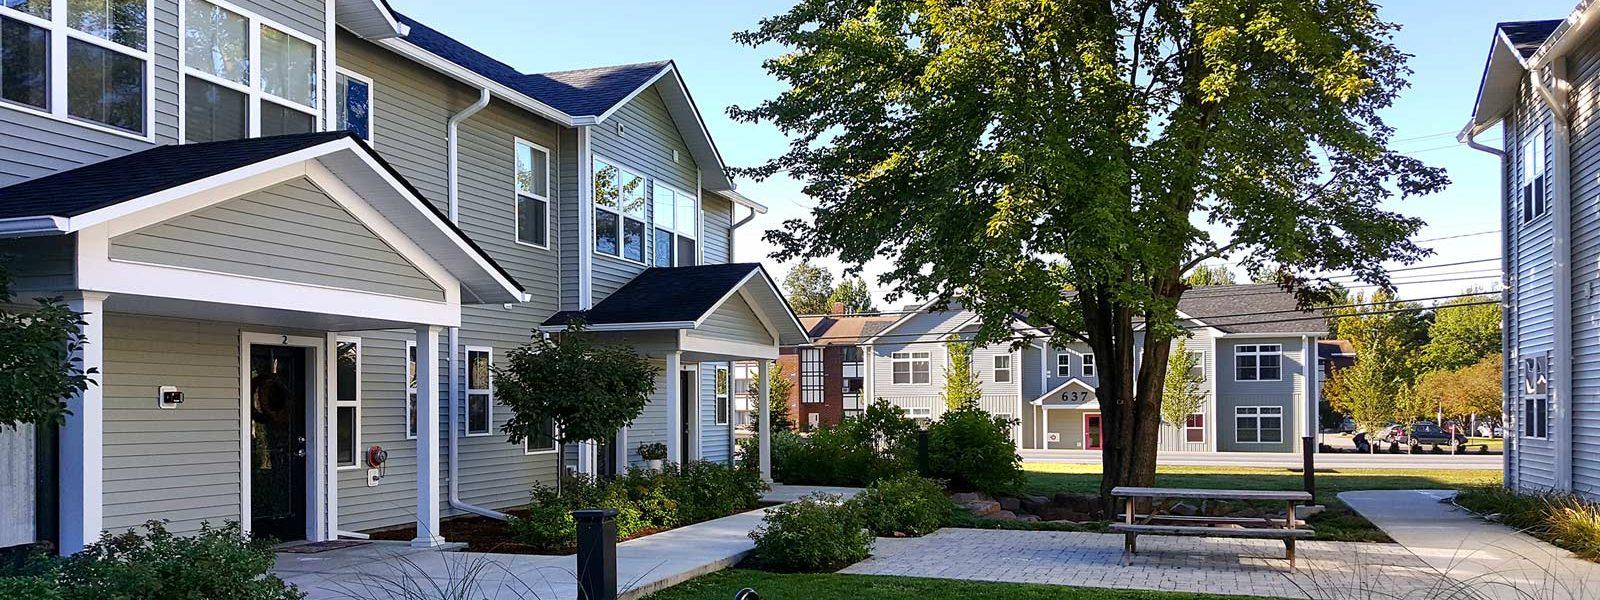 1 2 Bedroom South Burlington Apartments For Rent Rye Apartments